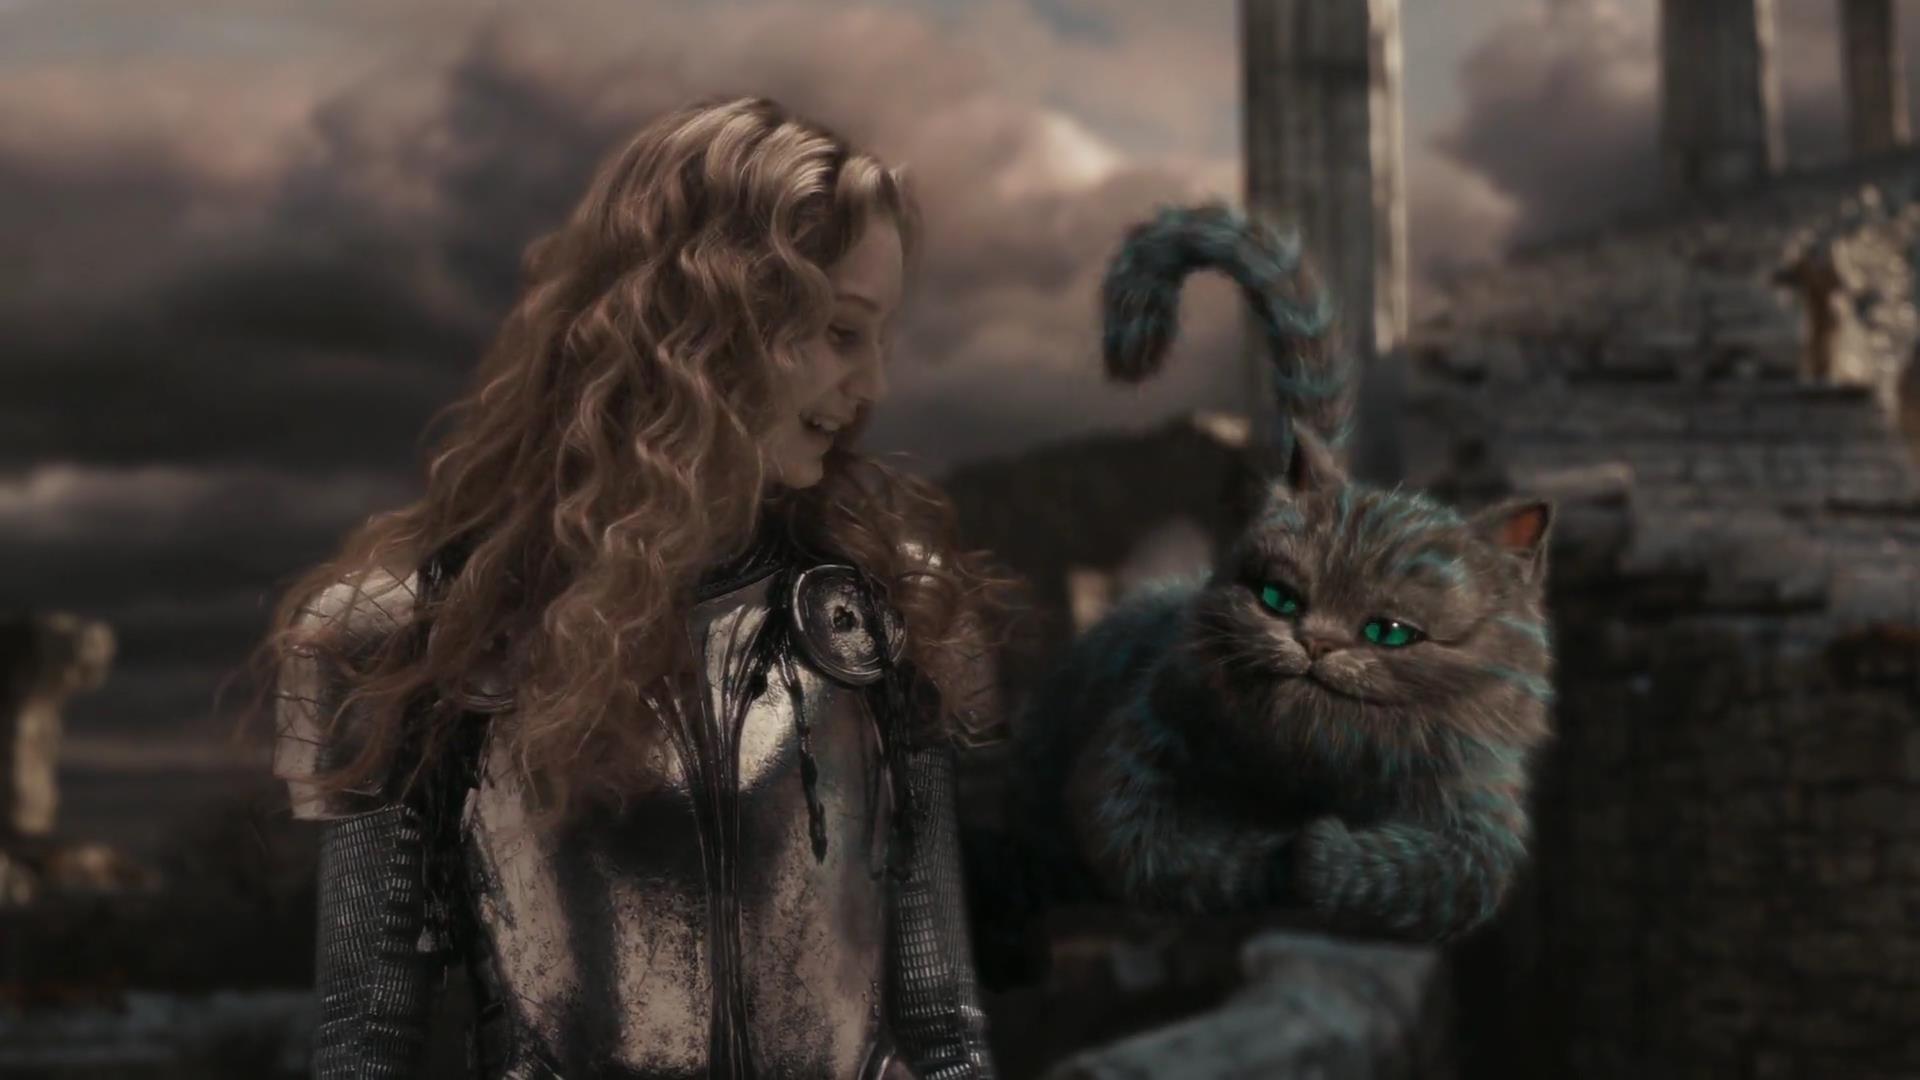 Alice in Wonderland (2010).